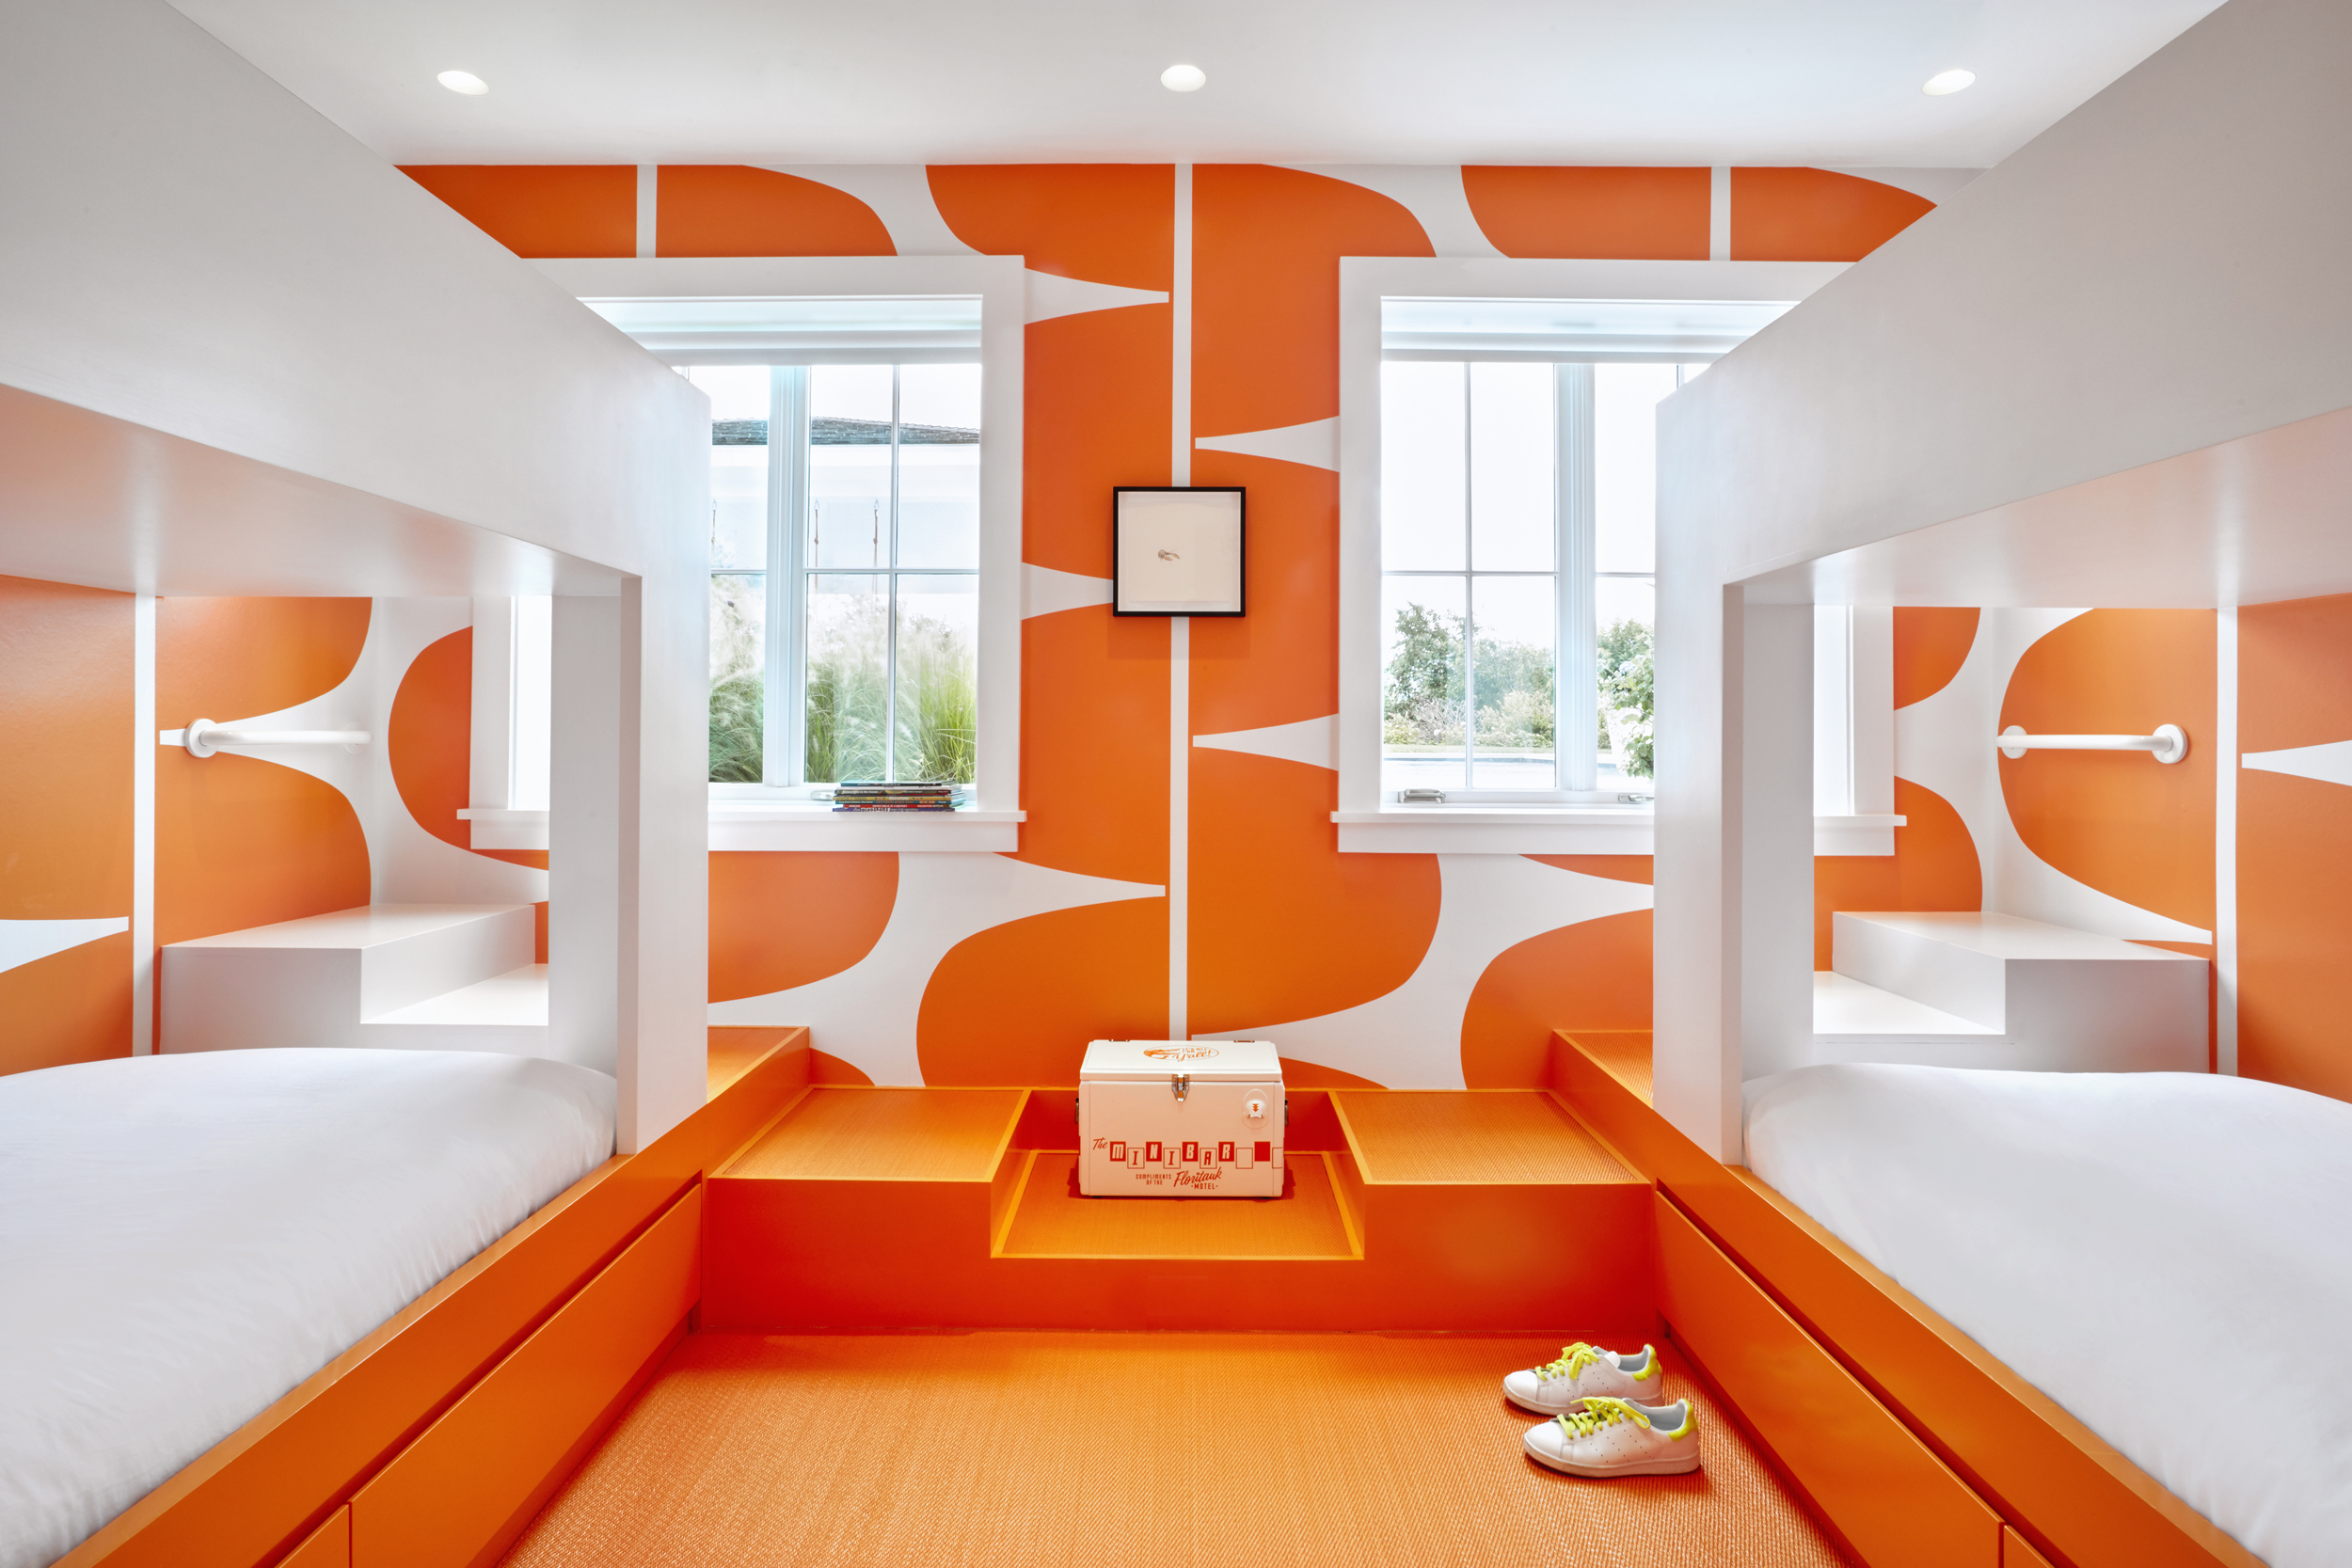 © ghislaine vinas interior design_montauk_bunk.jpg